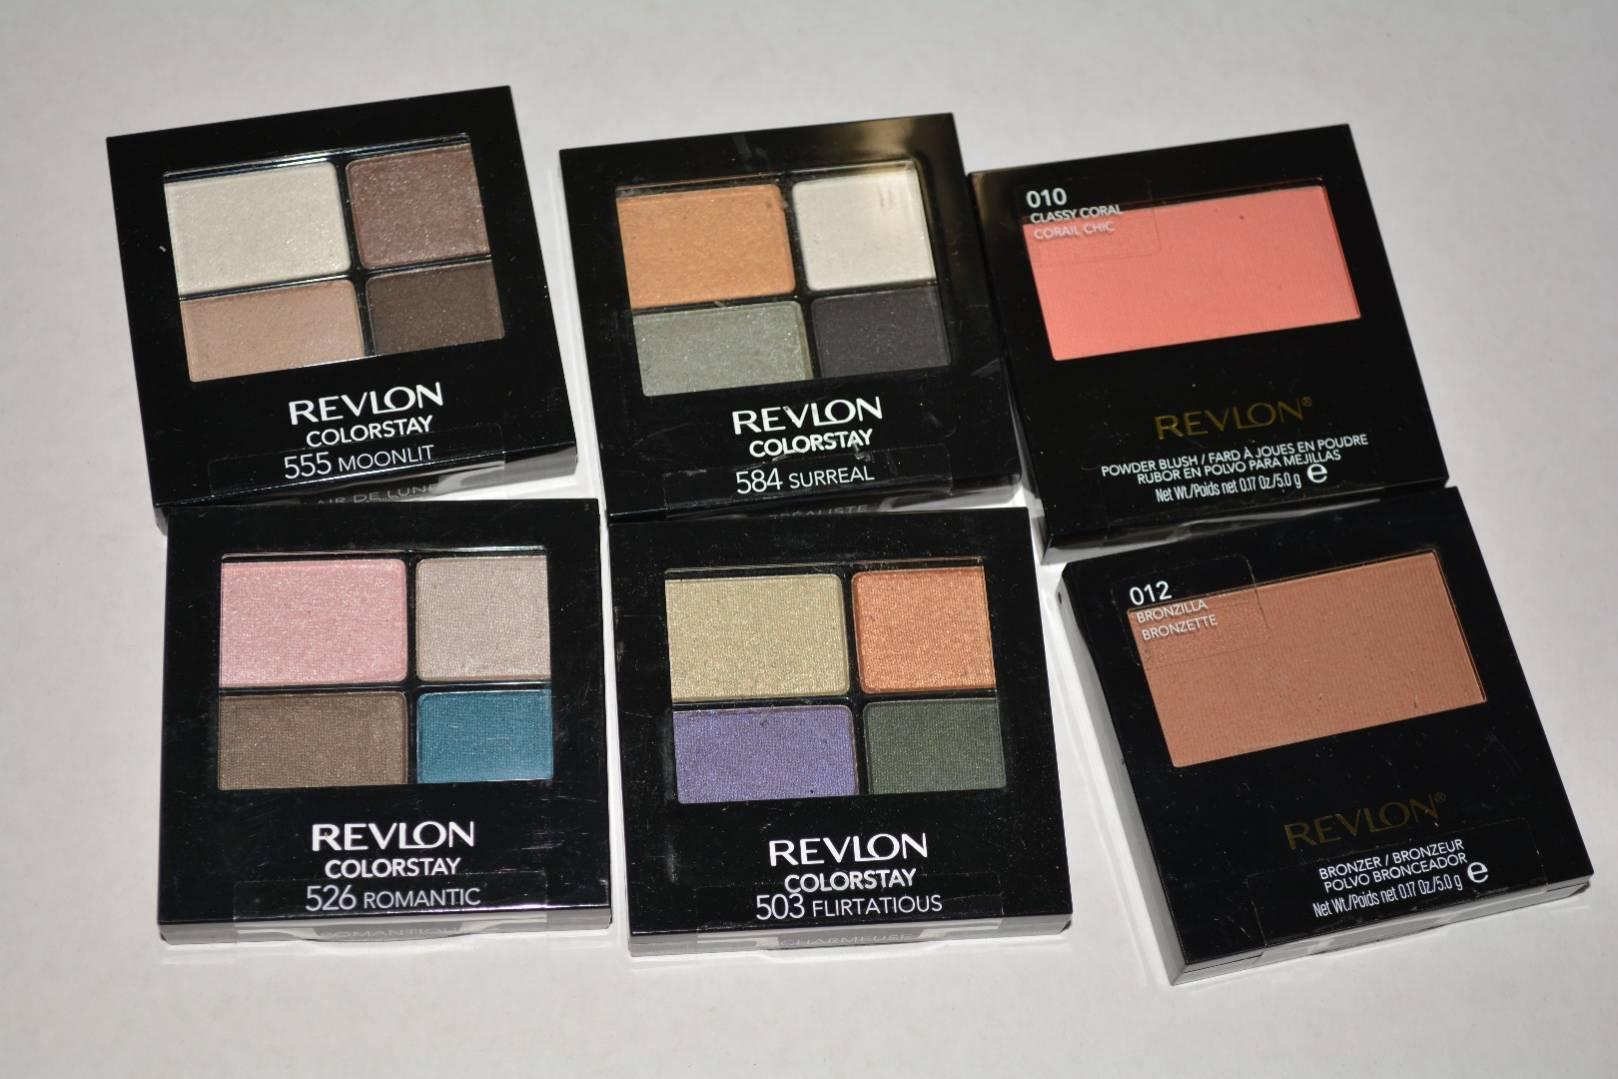 Bourjois, Biotherm, Maybelline, Revlon, Artdeco Cosmetics, Skincare, Makeup & Beauty supplies.